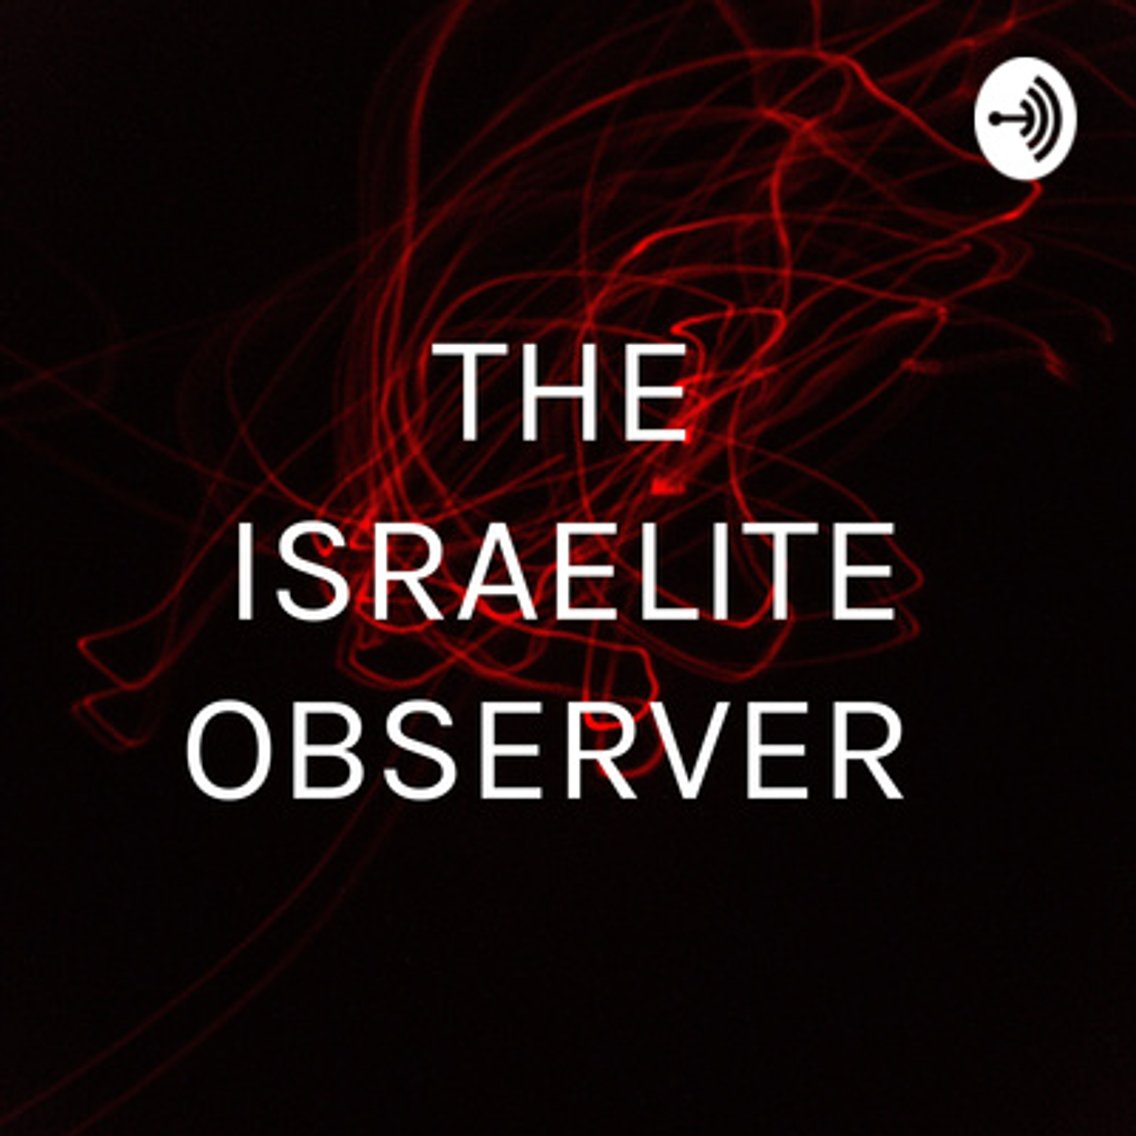 THE ISRAELITE OBSERVER - Cover Image